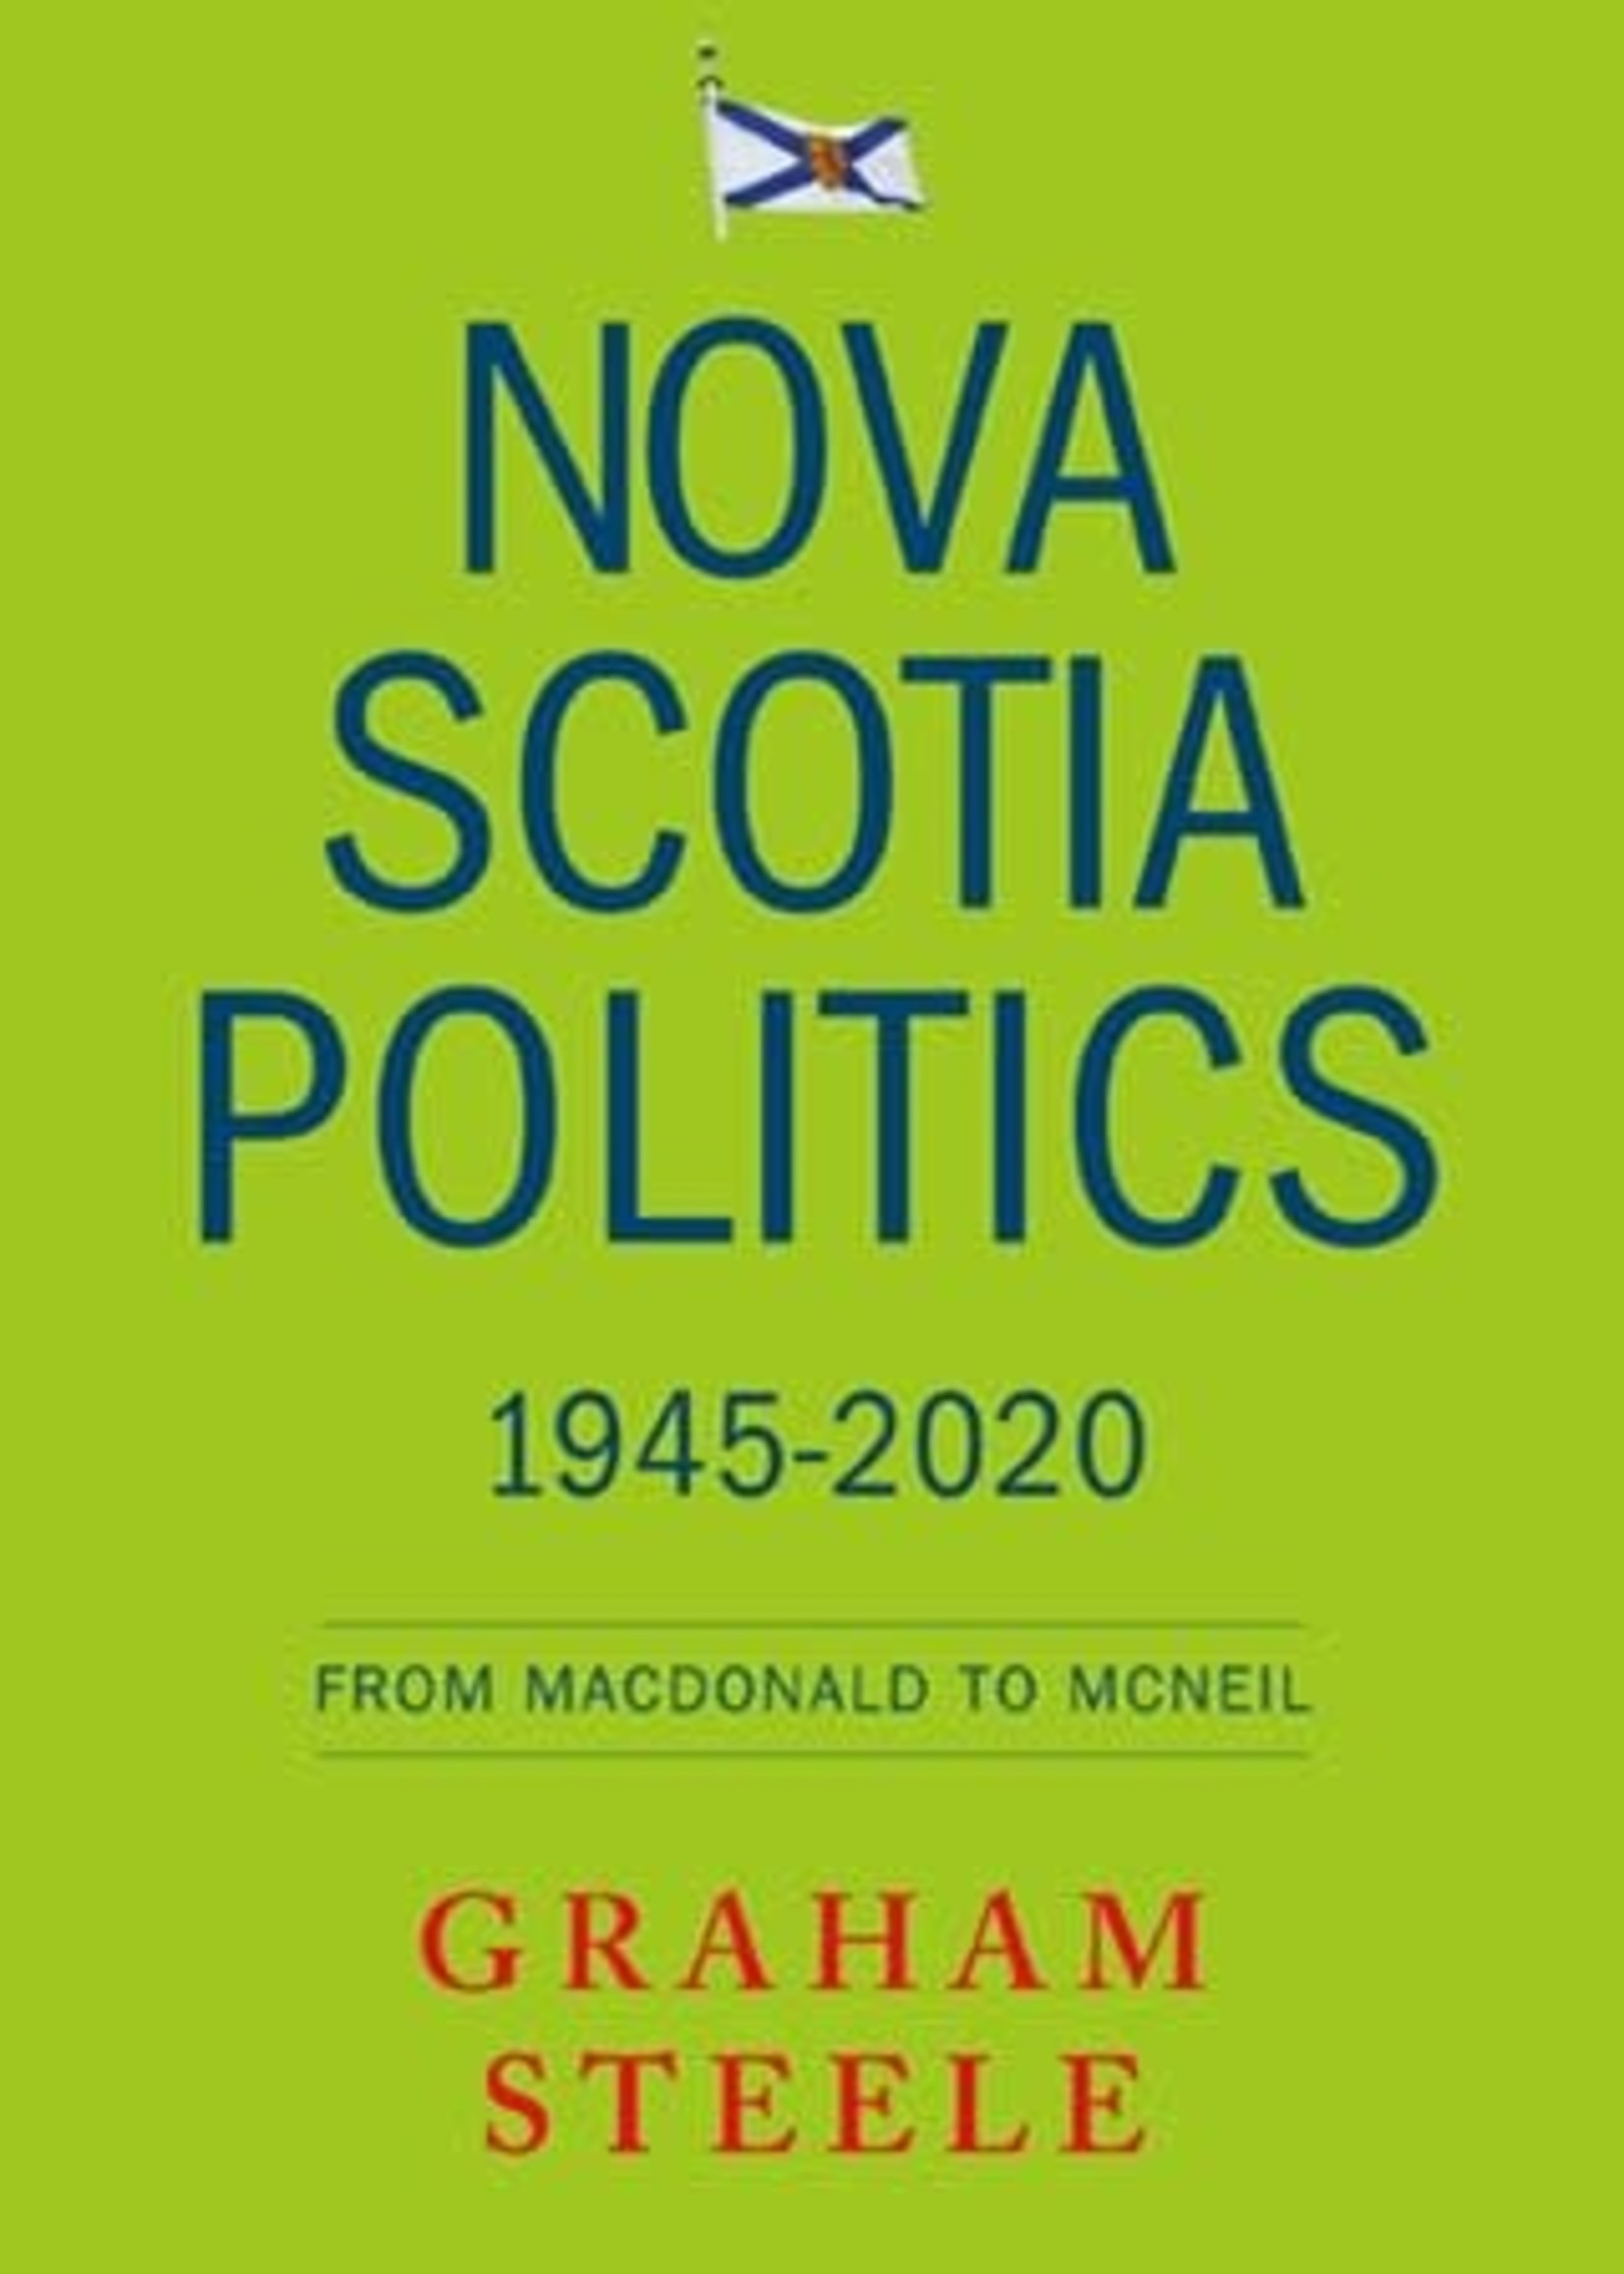 Nova Scotia Politics 1945-2020: From Macdonald to MacNeil by Graham Steele